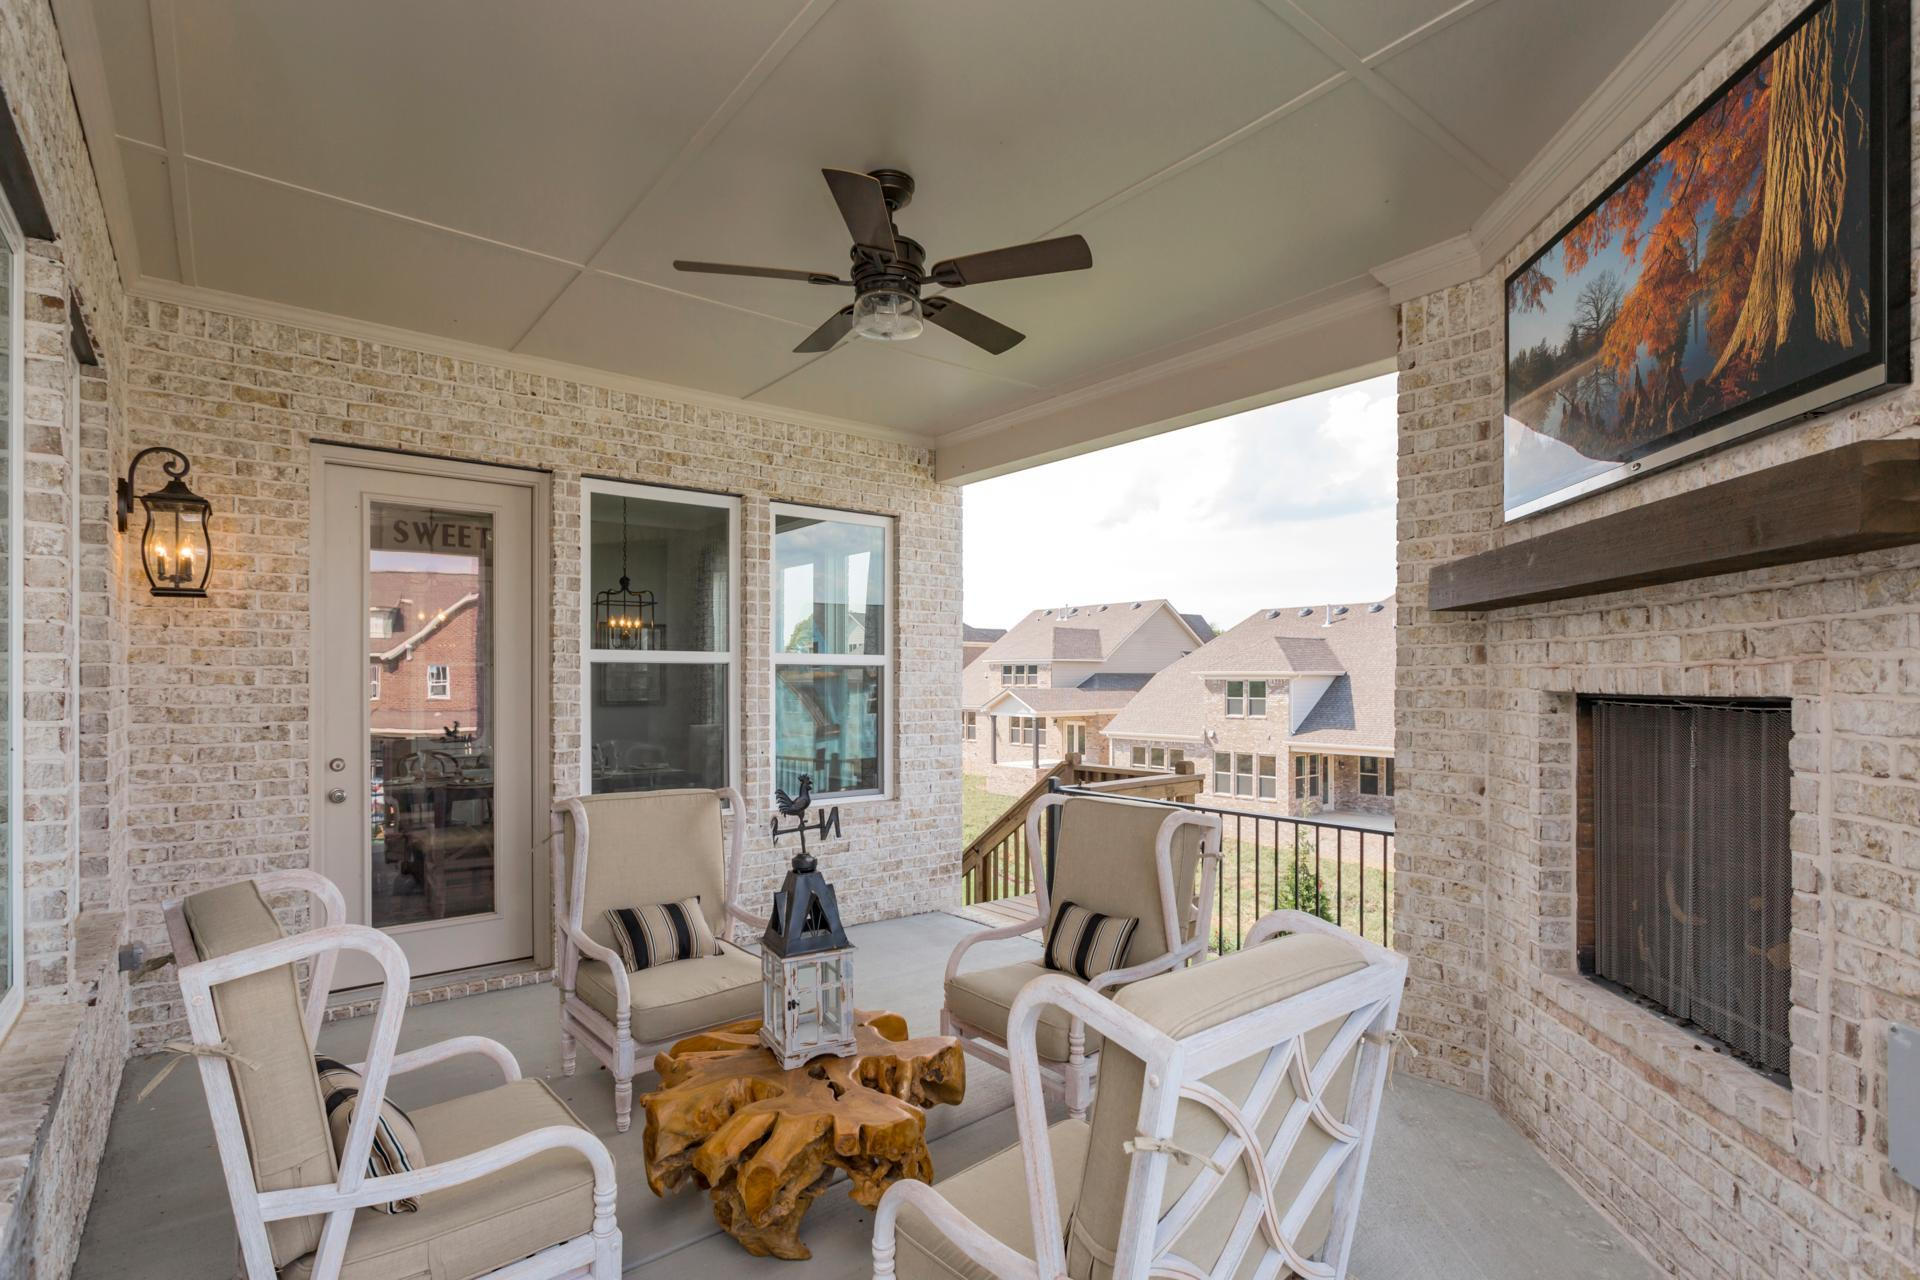 单亲家庭 为 销售 在 Somerville 988 Quinn Terrace Nolensville, Tennessee 37135 United States